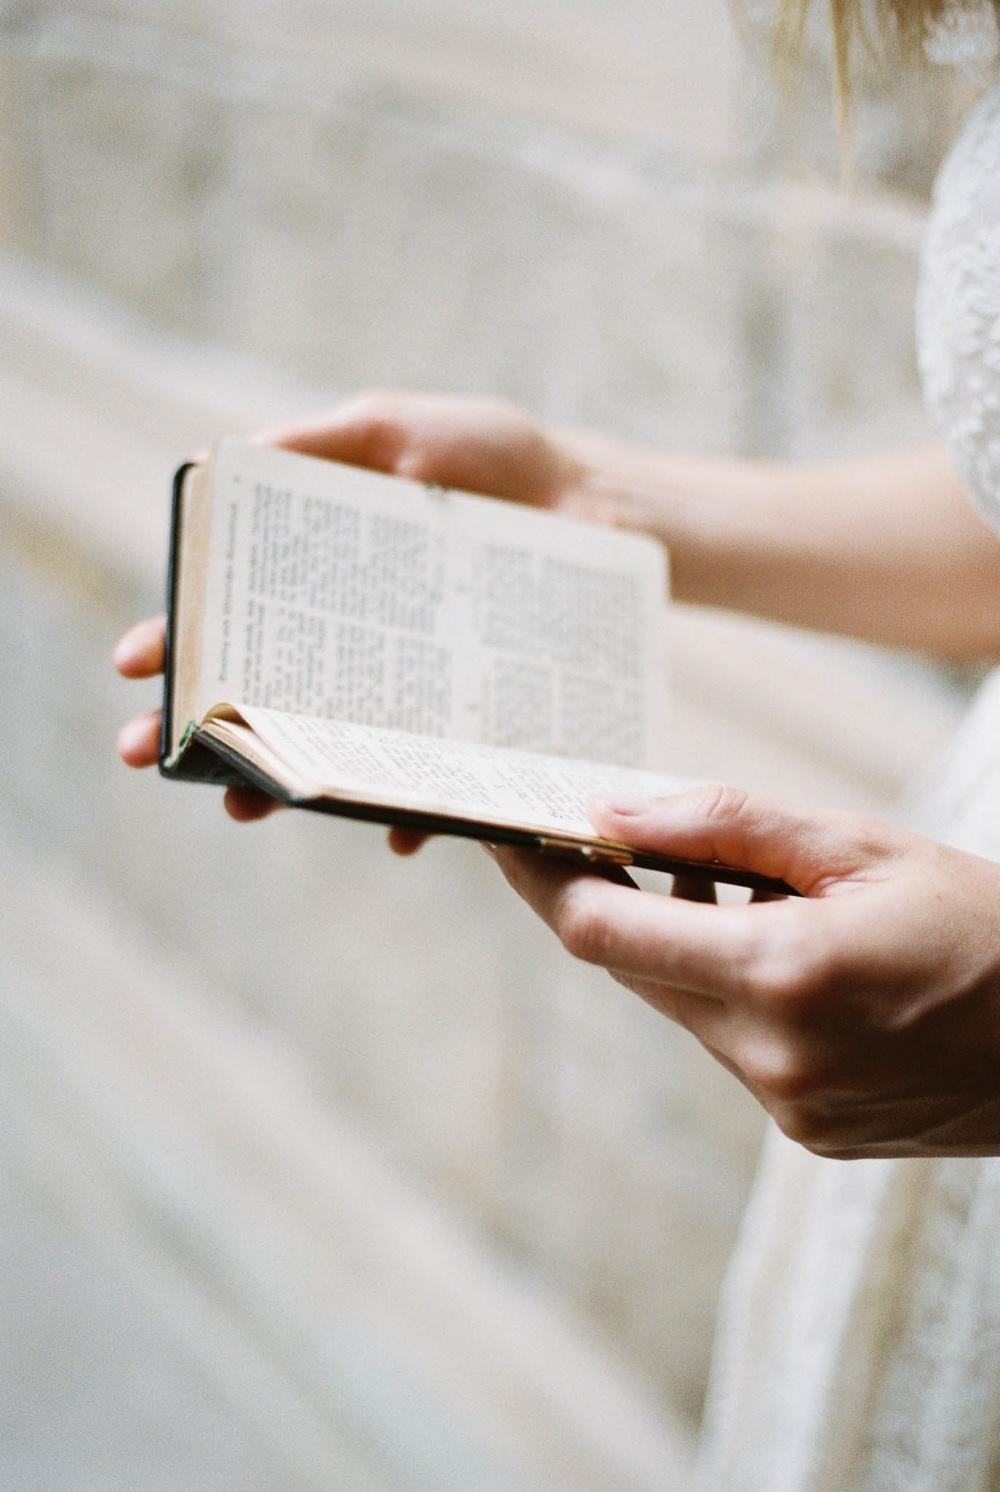 all-saint-church-wedding-pasadnea-wedding-photography-lara-lam-15.jpg